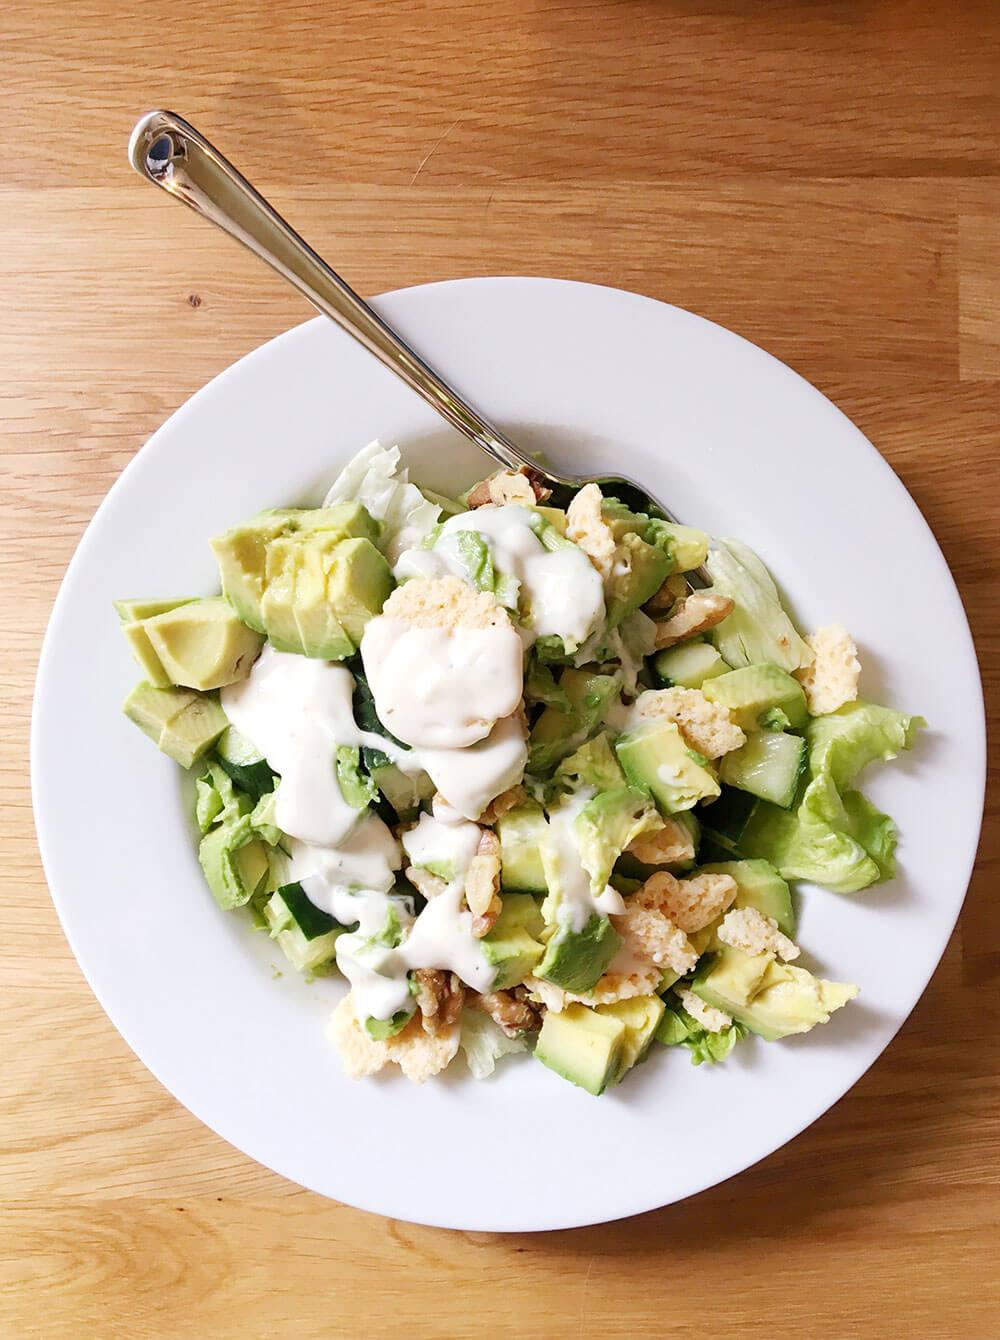 Eco-Friendly Salad